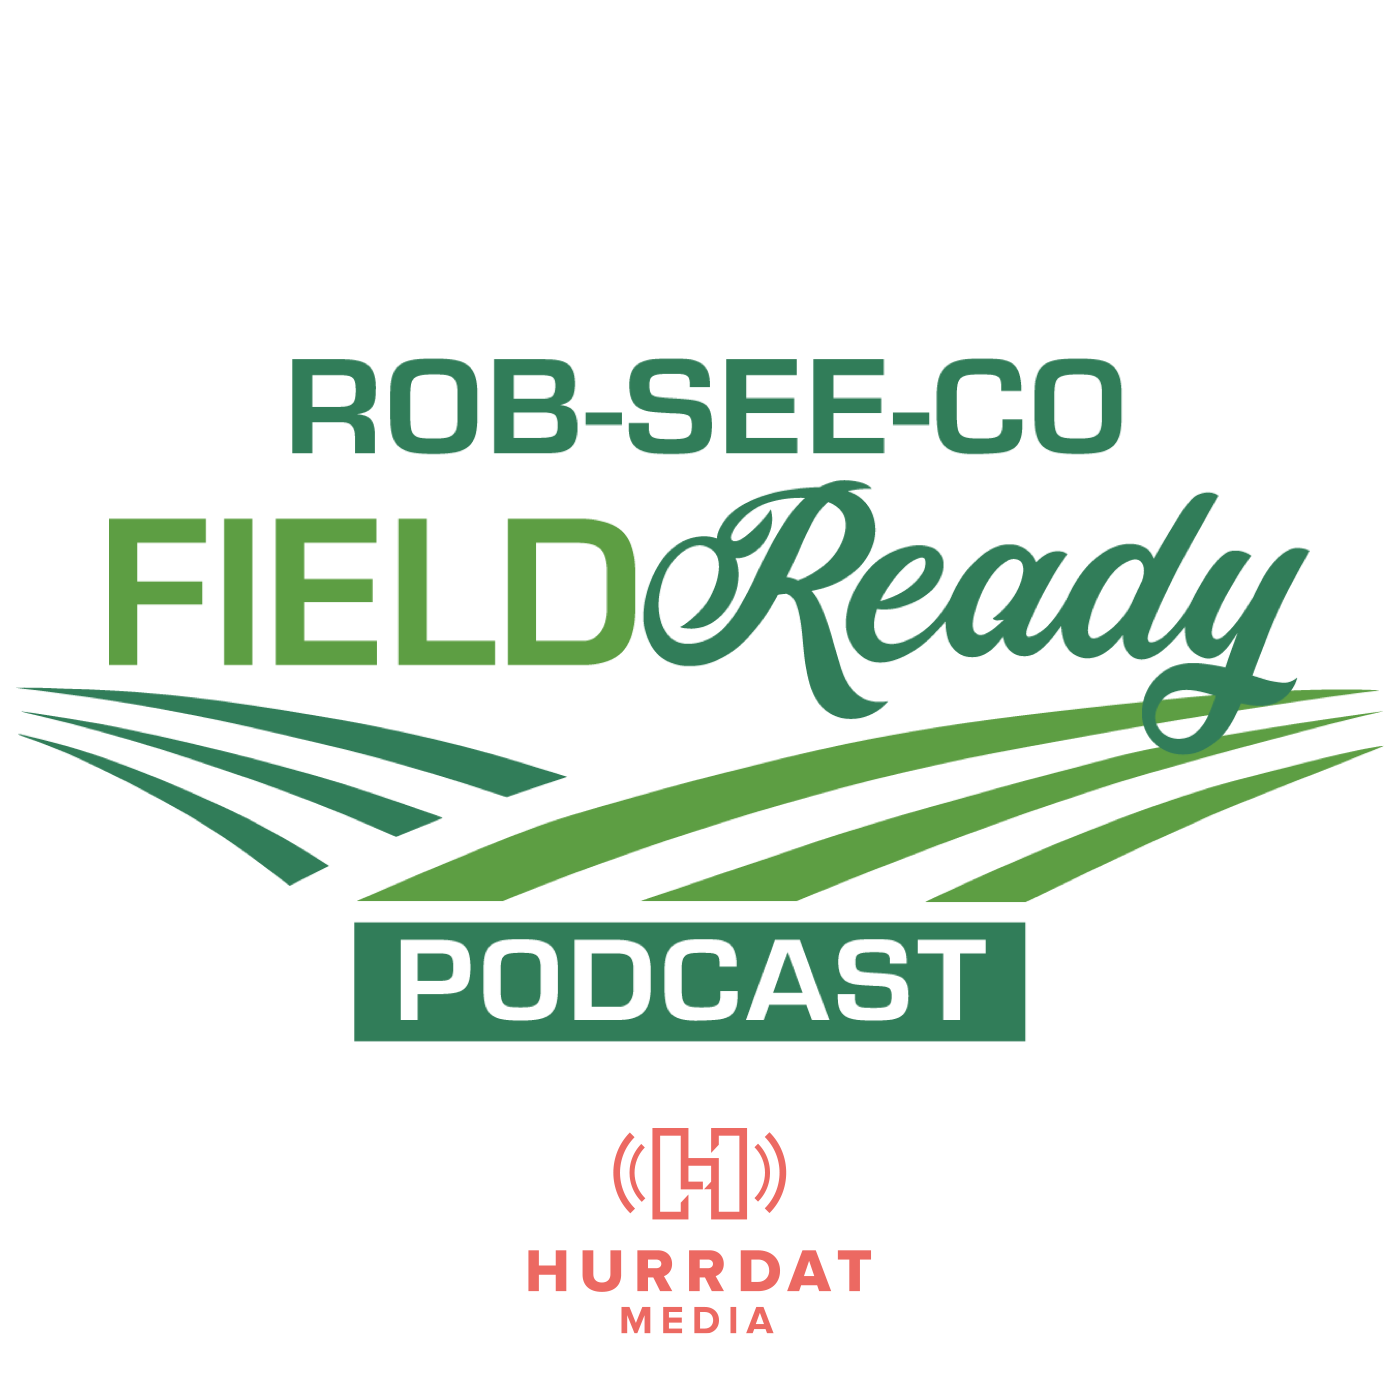 Field Ready Podcast show art